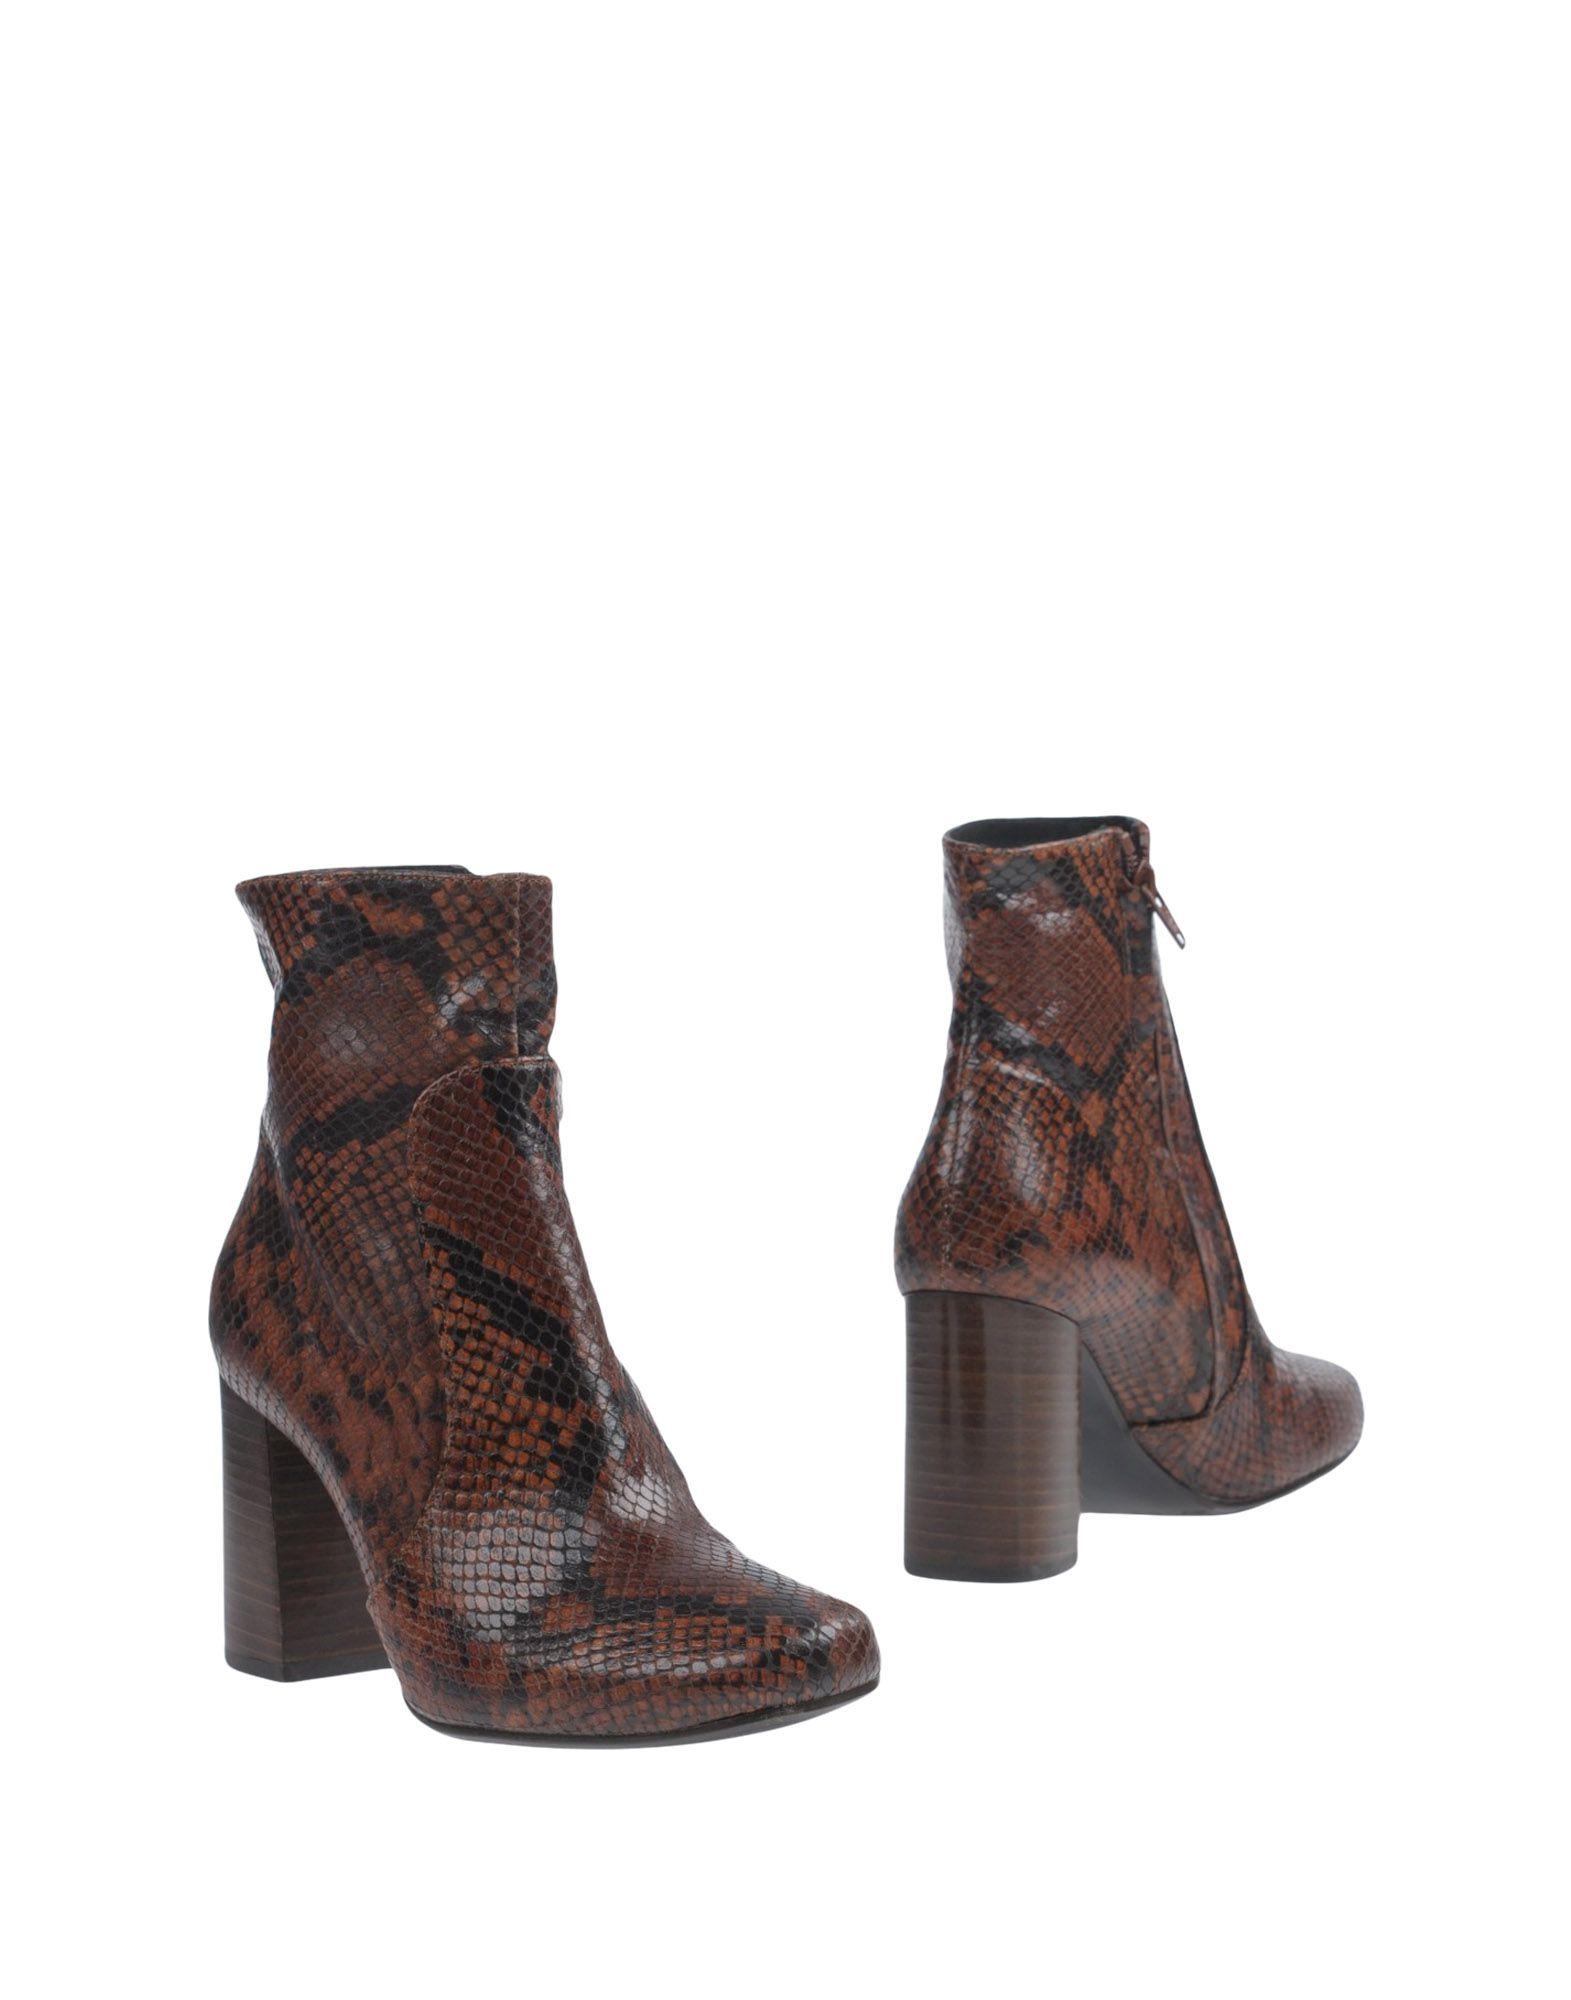 BILLI BI Copenhagen Полусапоги и высокие ботинки ivylee copenhagen полусапоги и высокие ботинки